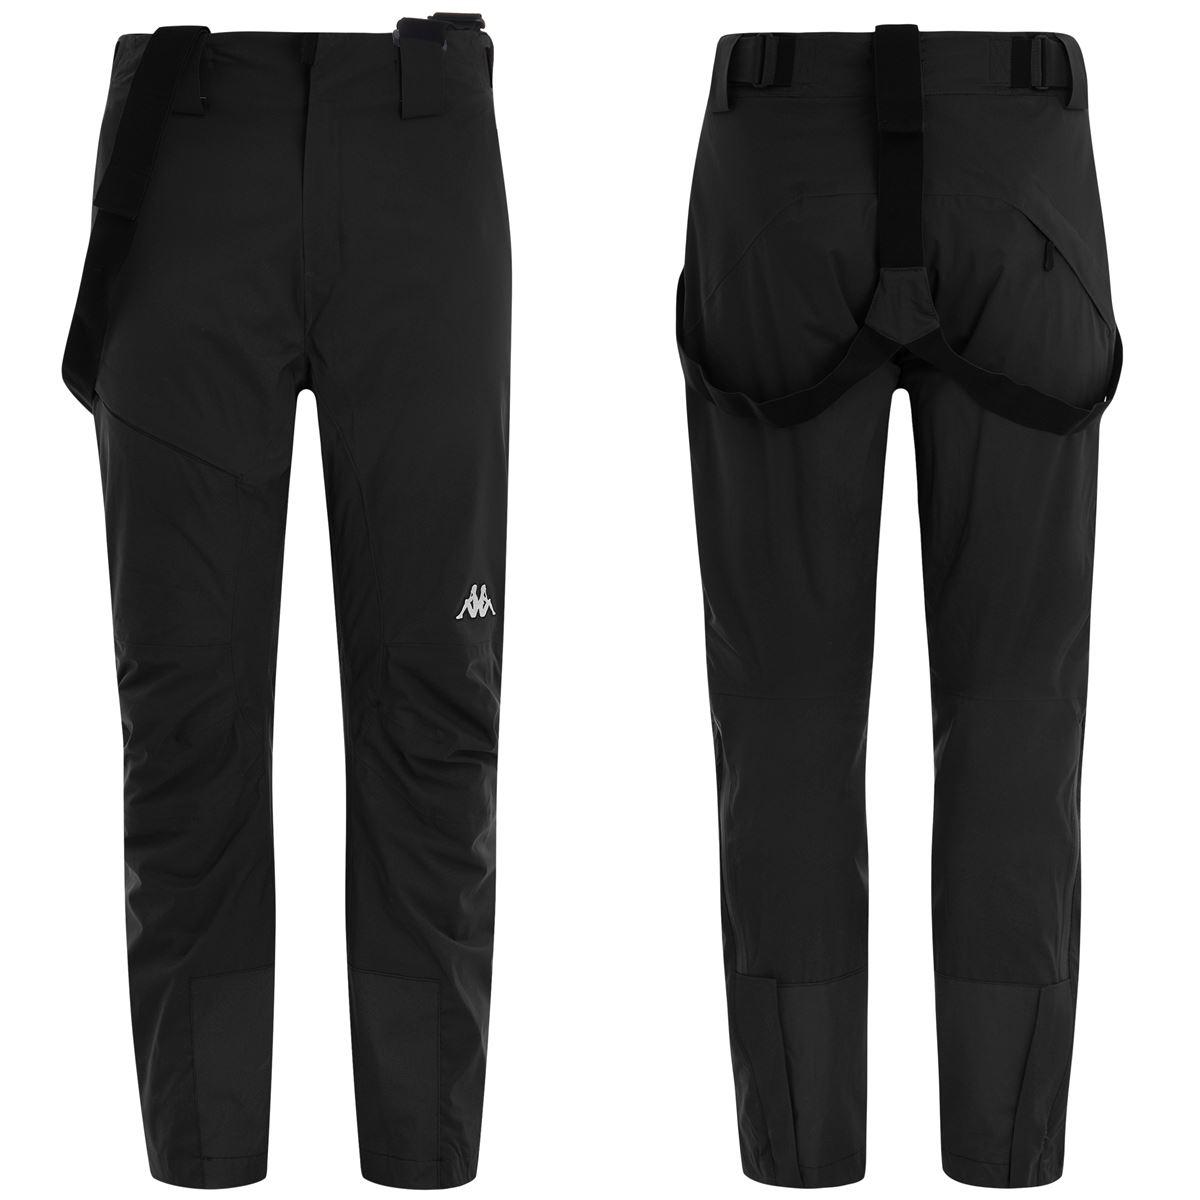 Zip 6cento Professional Kappa Sport Pantalone 622a Full nWv0dwwgqU